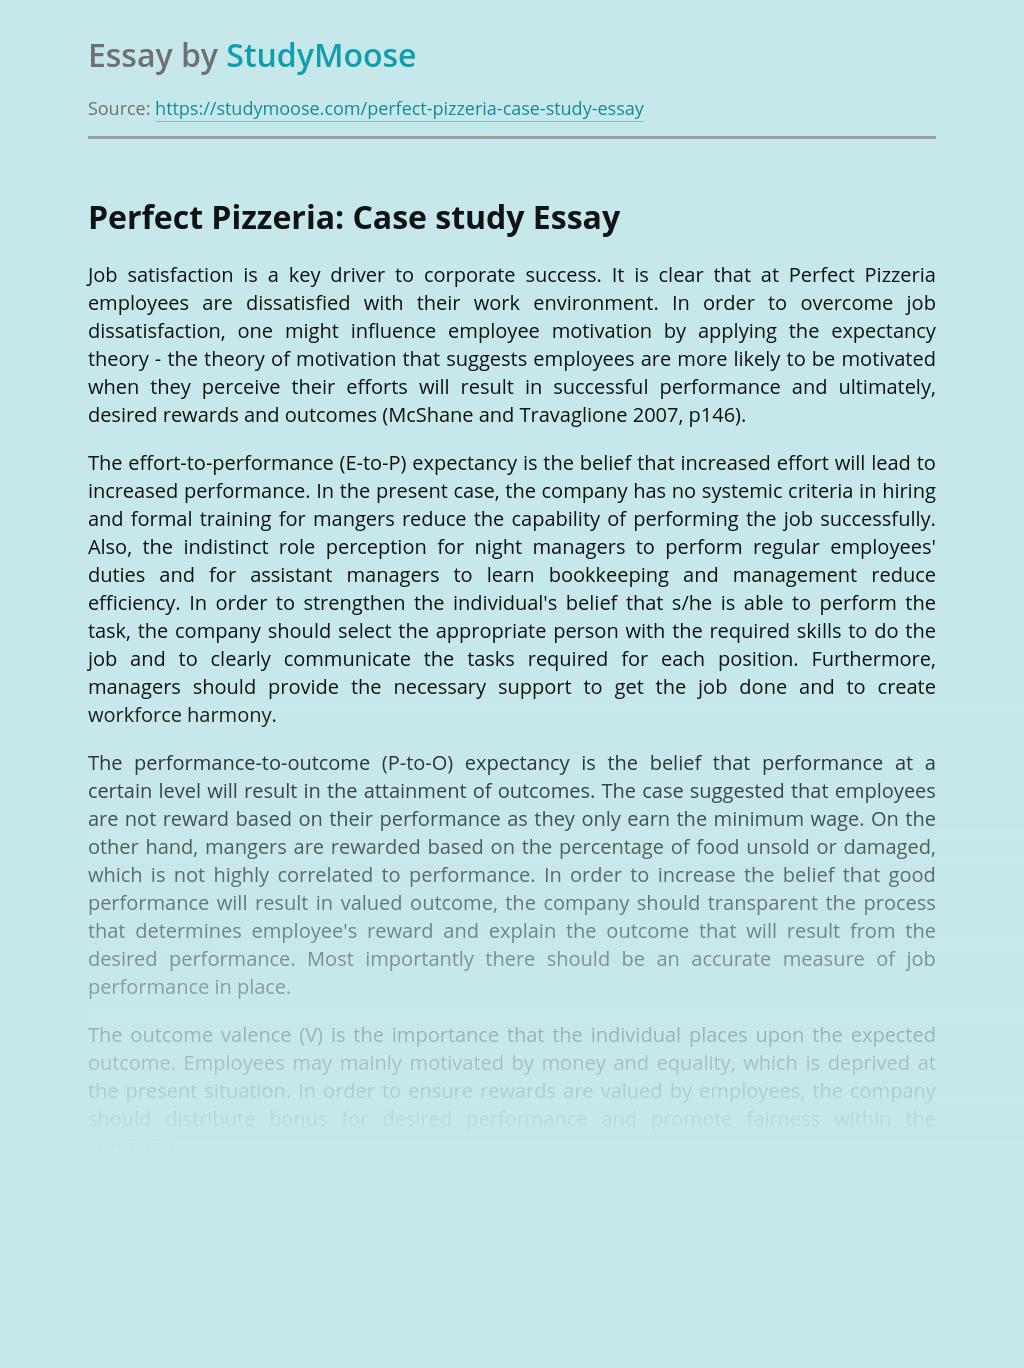 Perfect Pizzeria: Case study